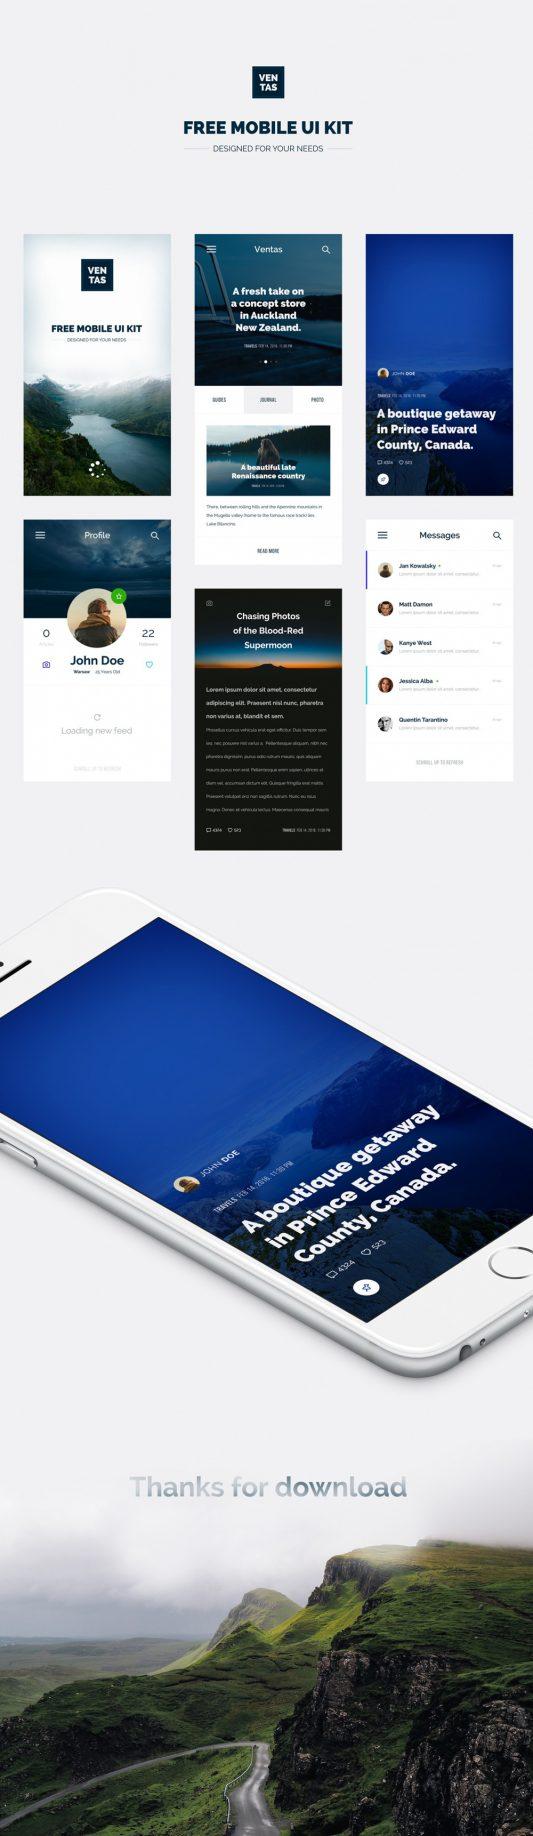 Travel Magazine Mobile App UI Kit Free PSD